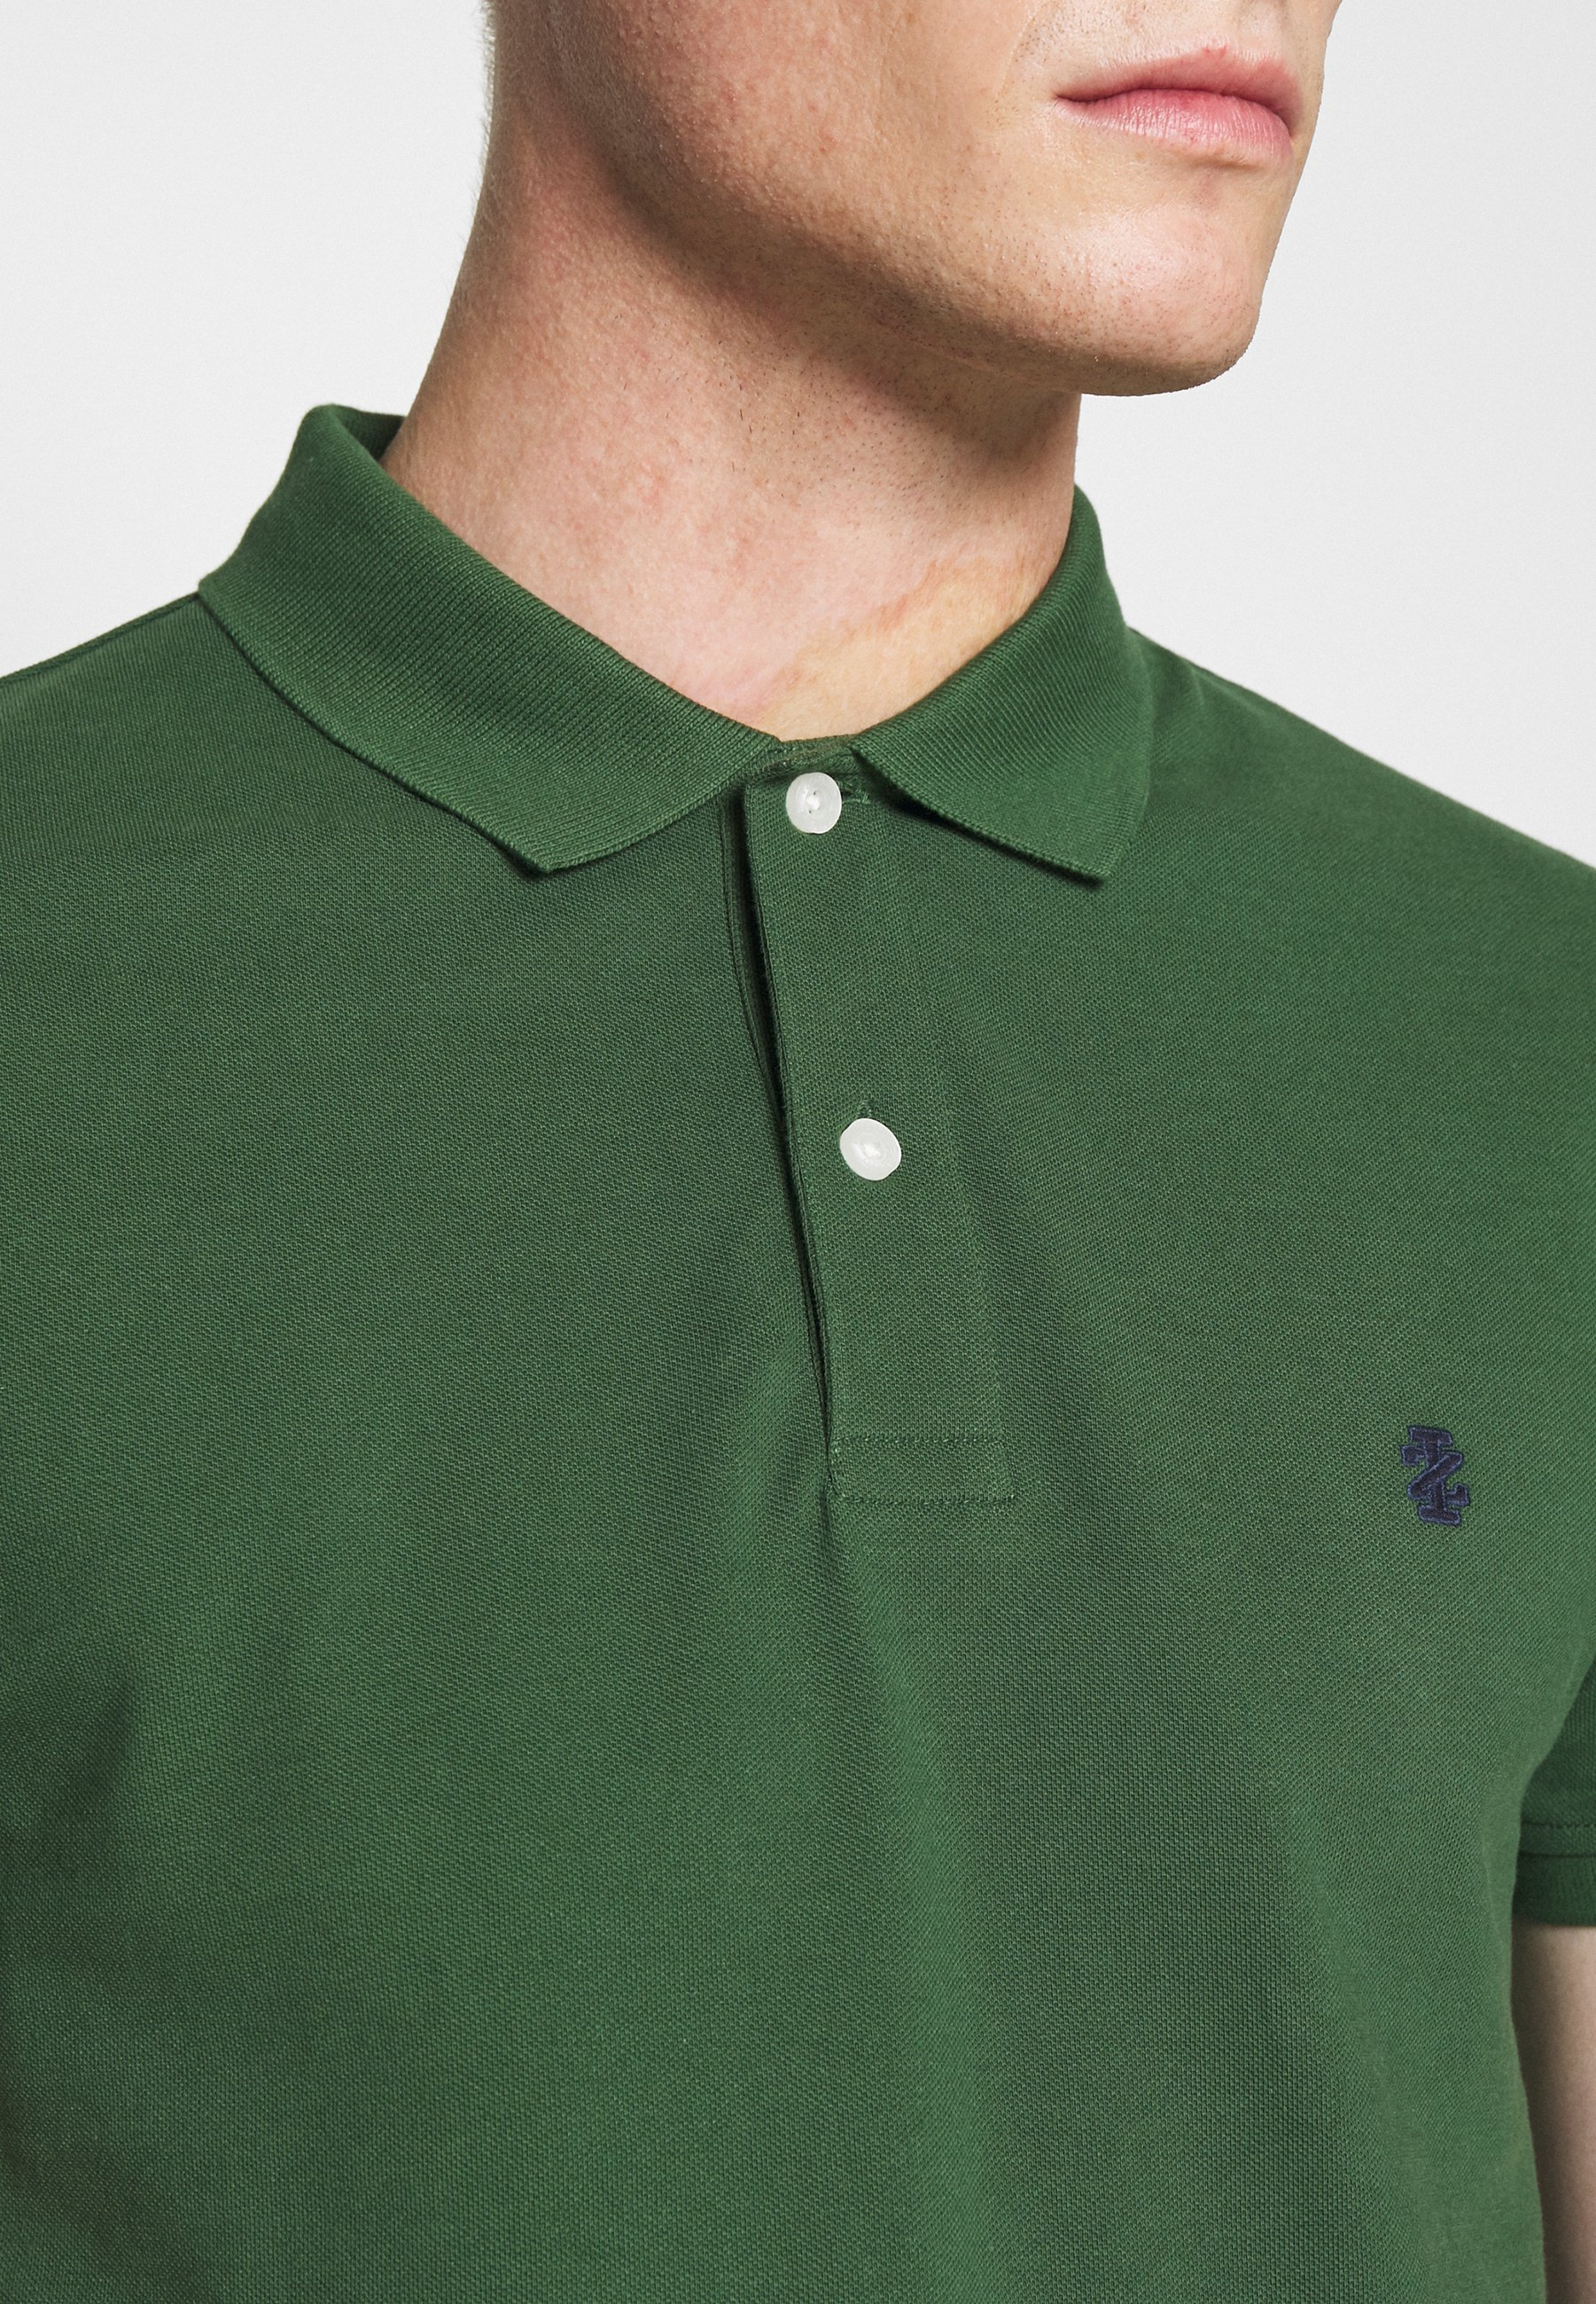 IZOD Polo shirt - greener pastures uacOB